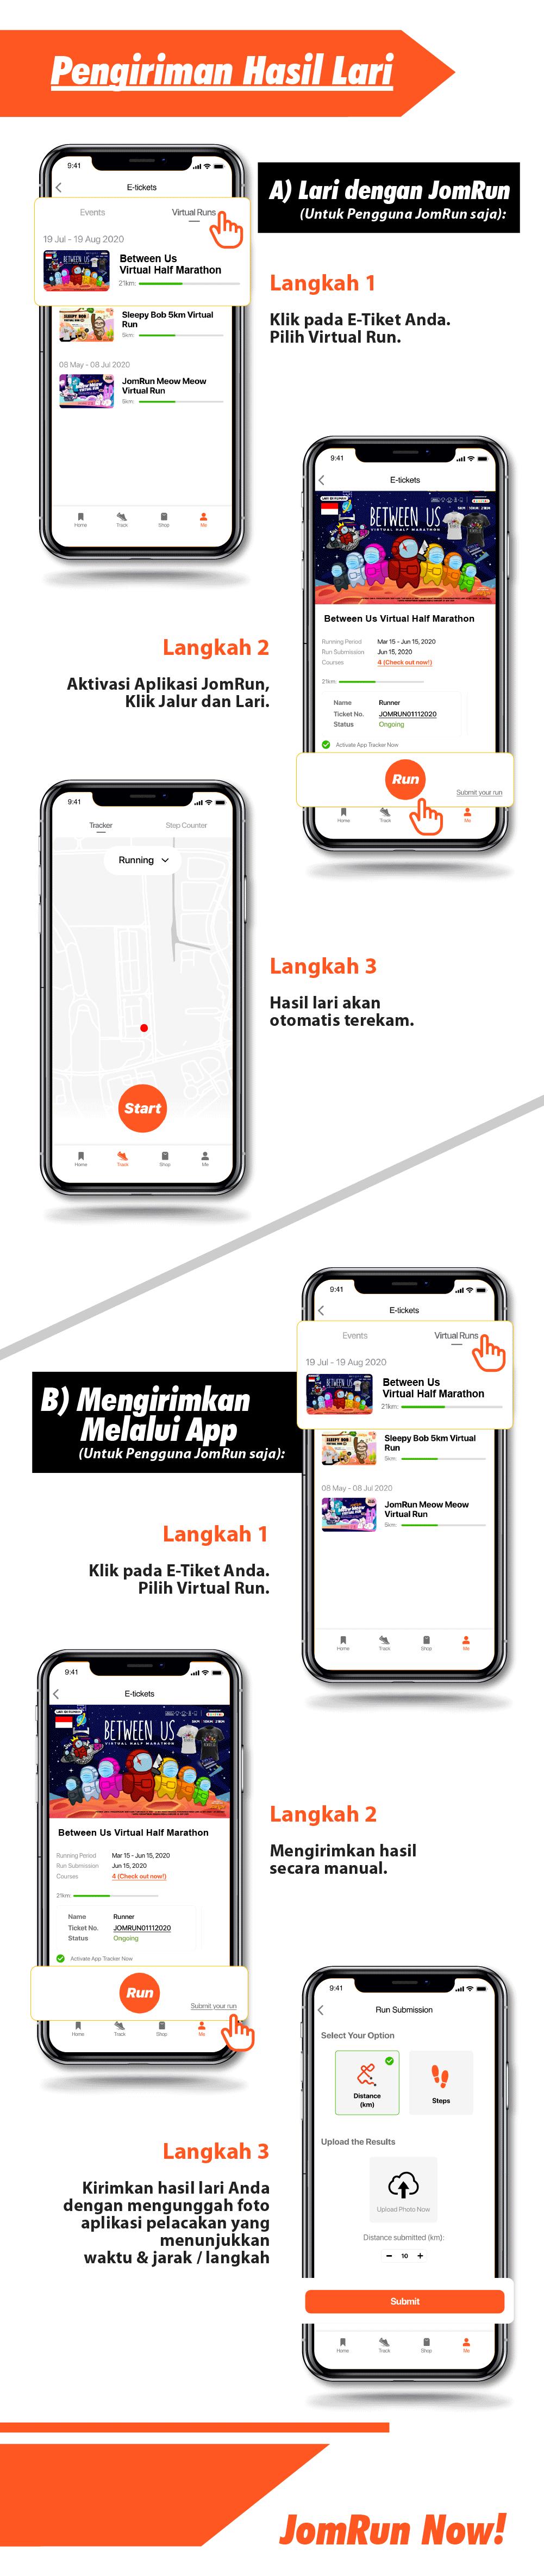 Hari Pahlawan Indonesia Virtual Marathon 2021 - Indonesia